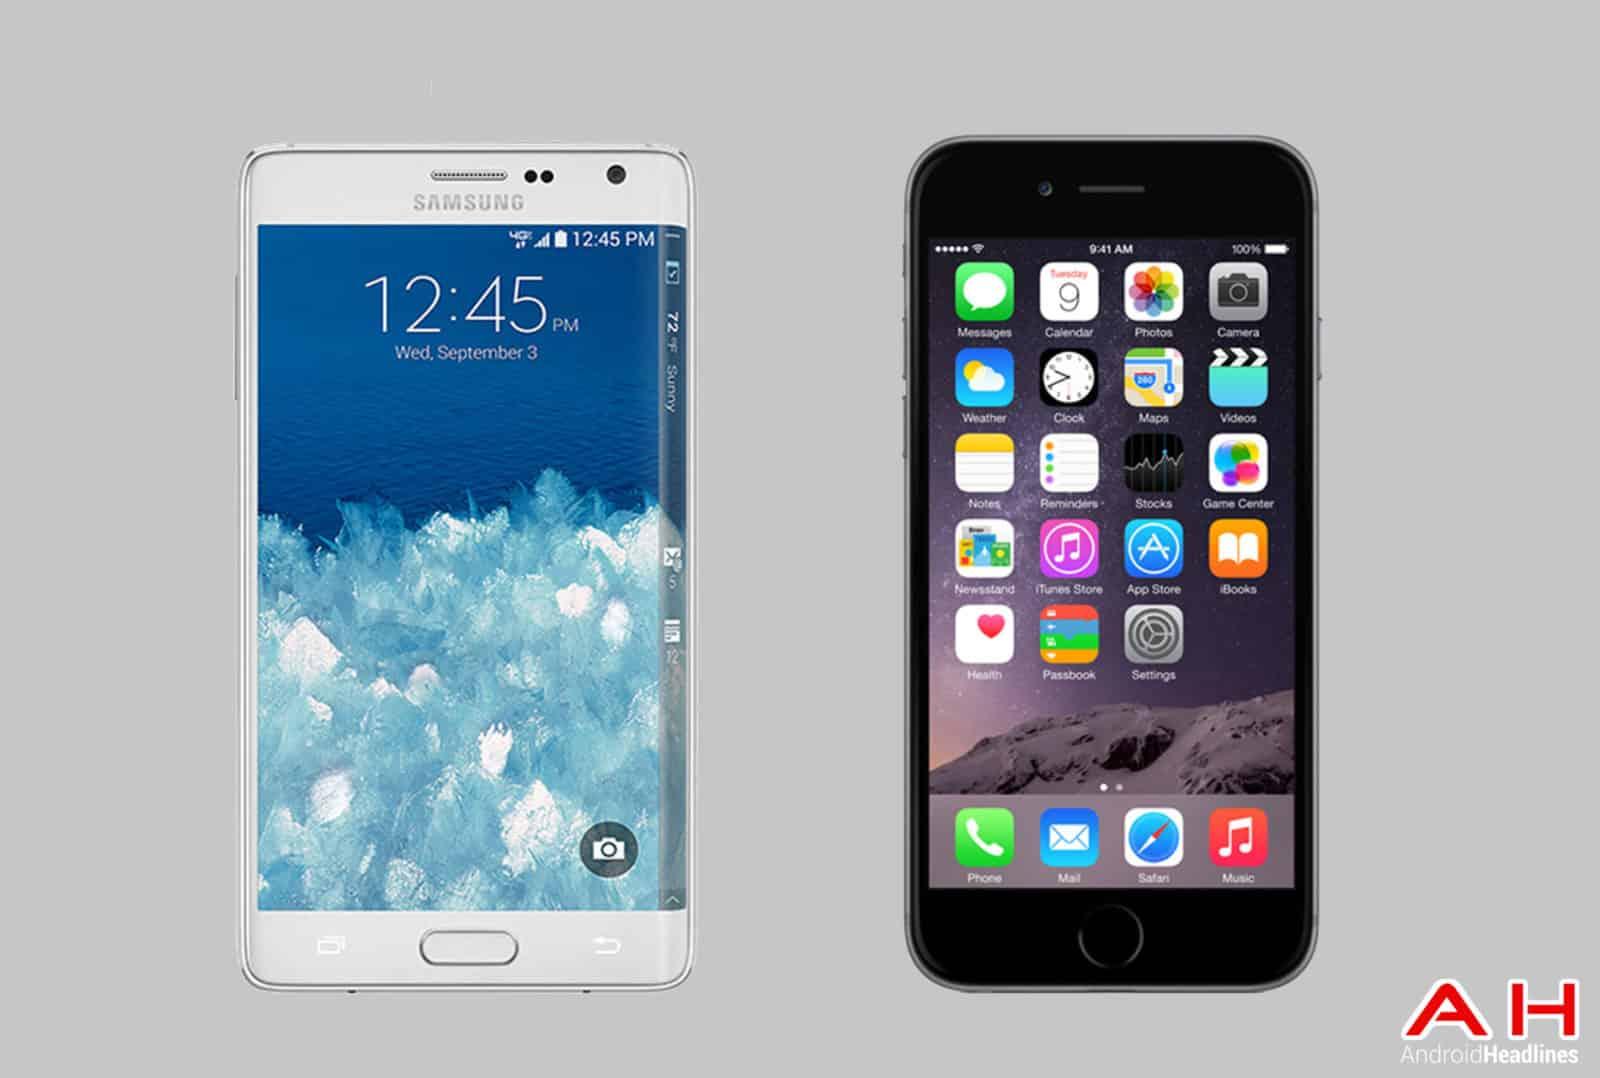 Galaxy Note Edge vs iPhone 6 Plus cam AH